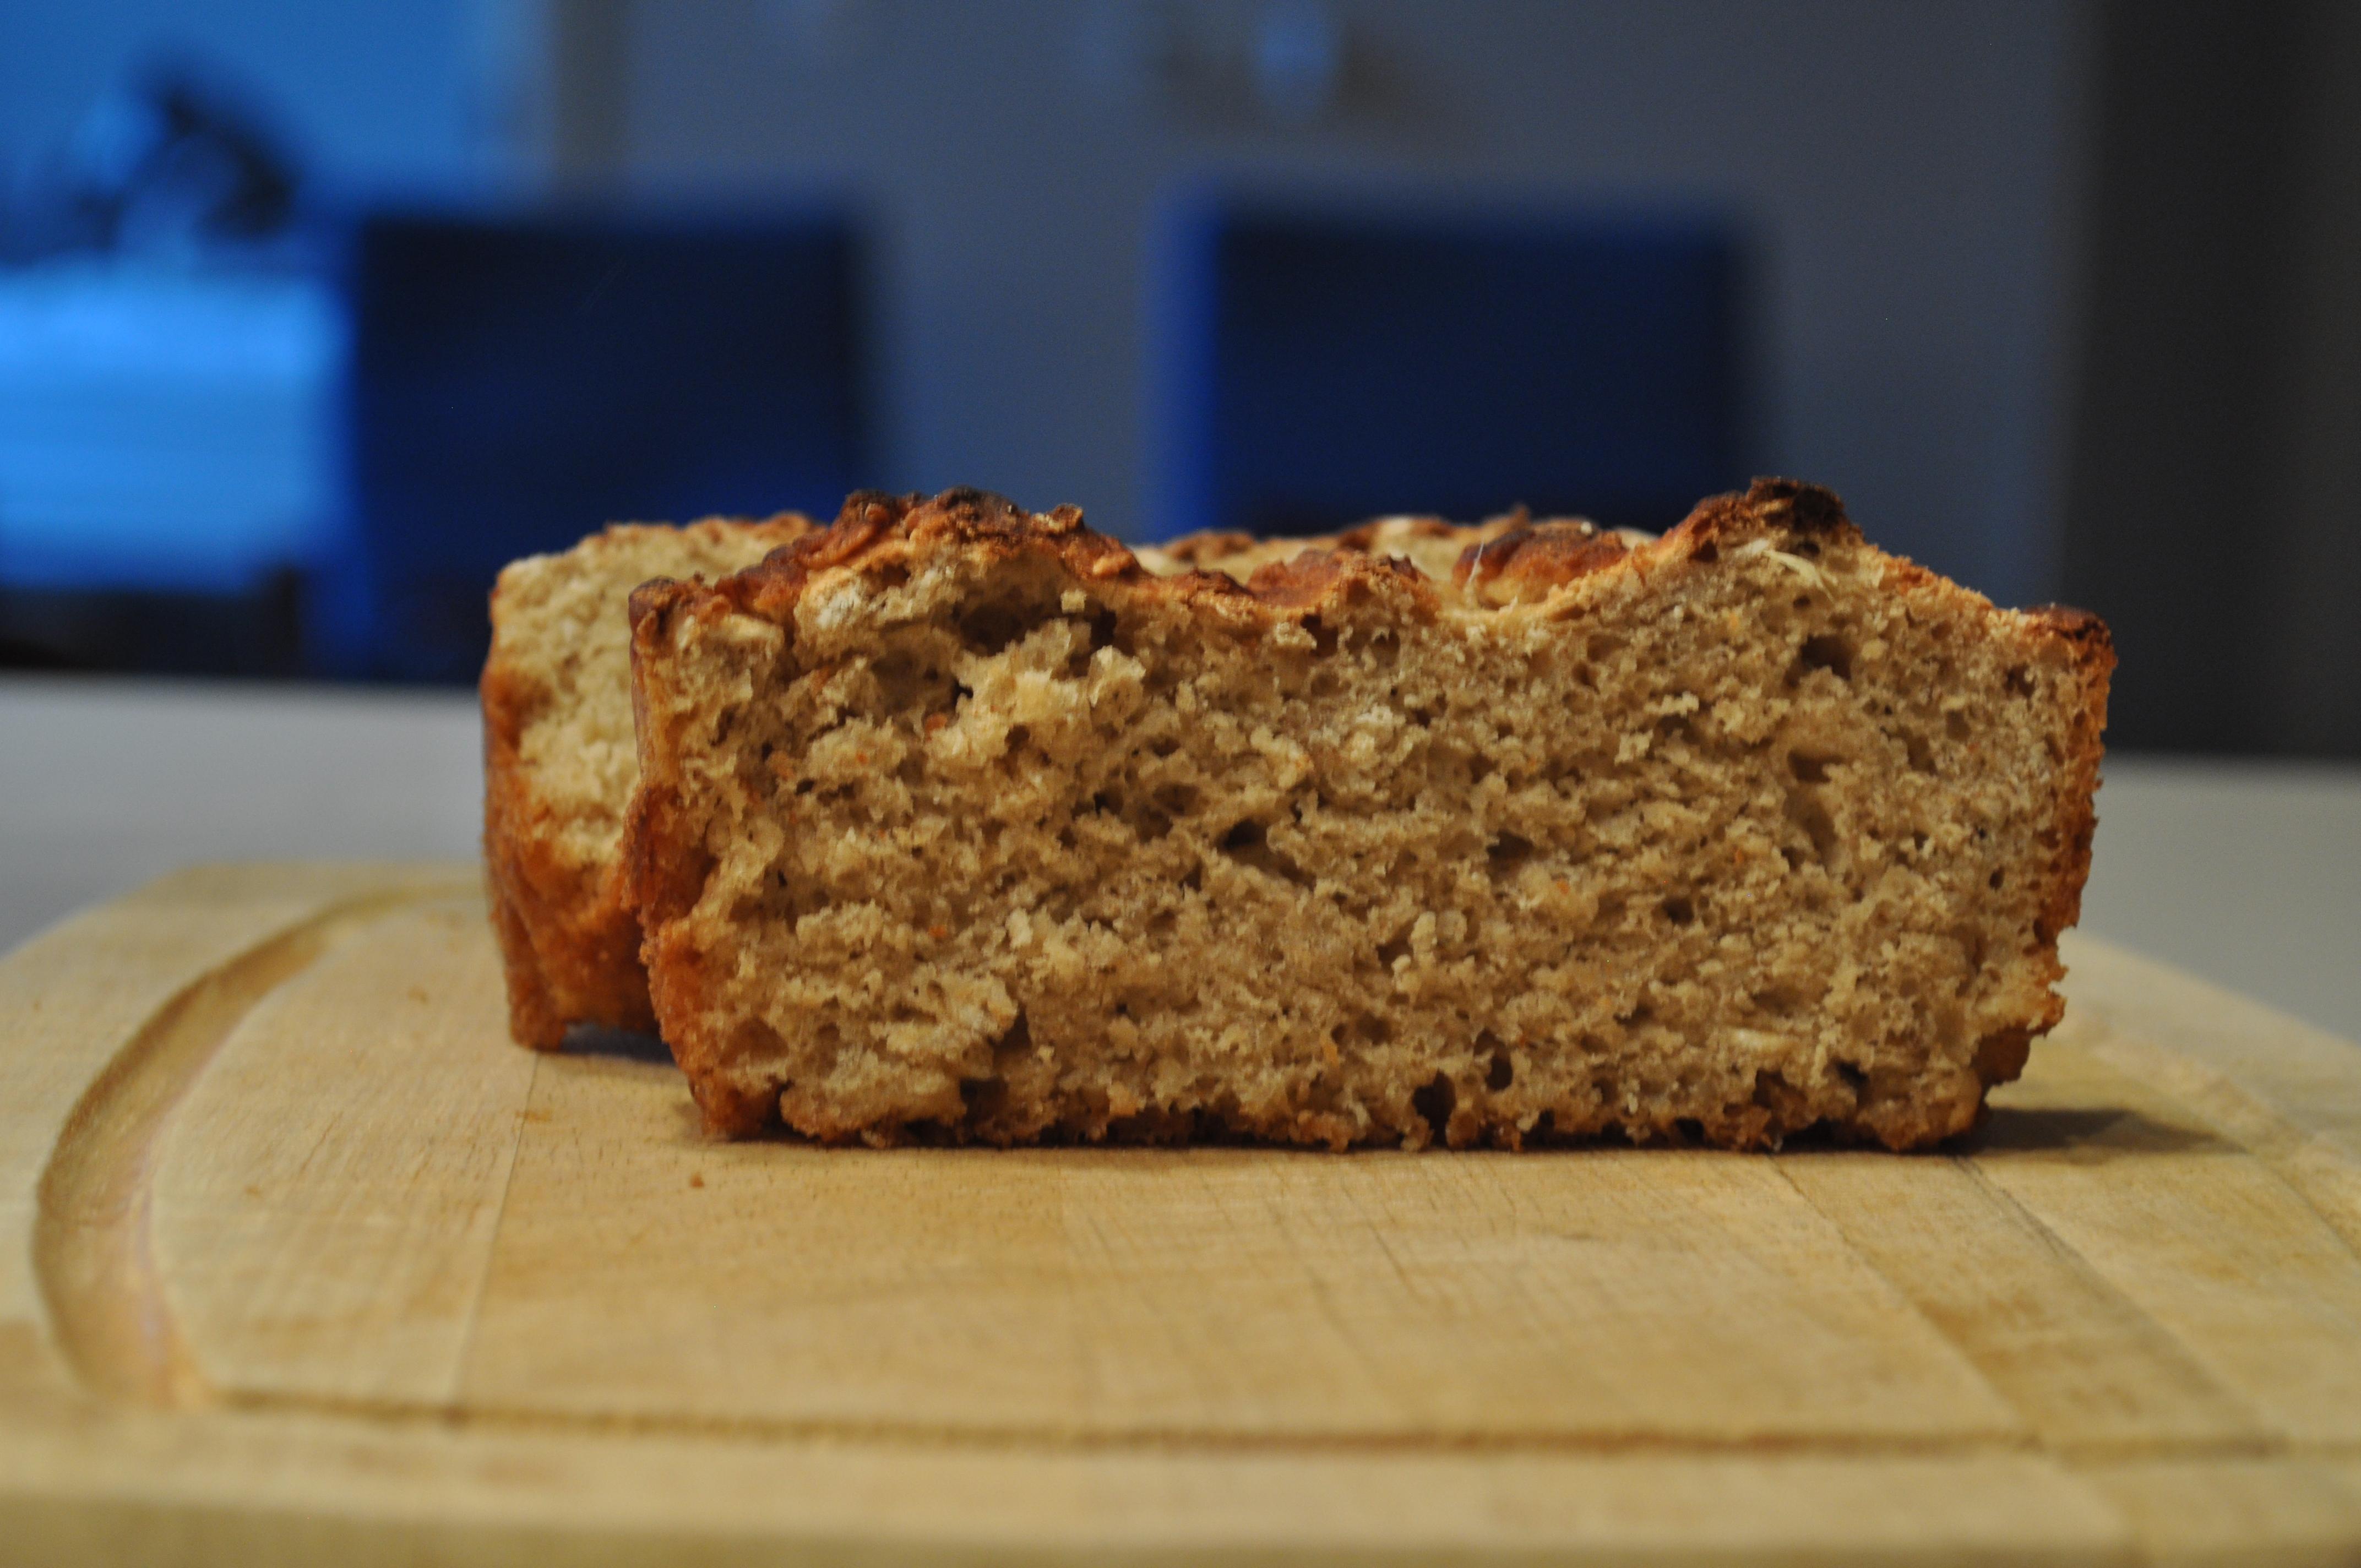 how to make hard bread soft again